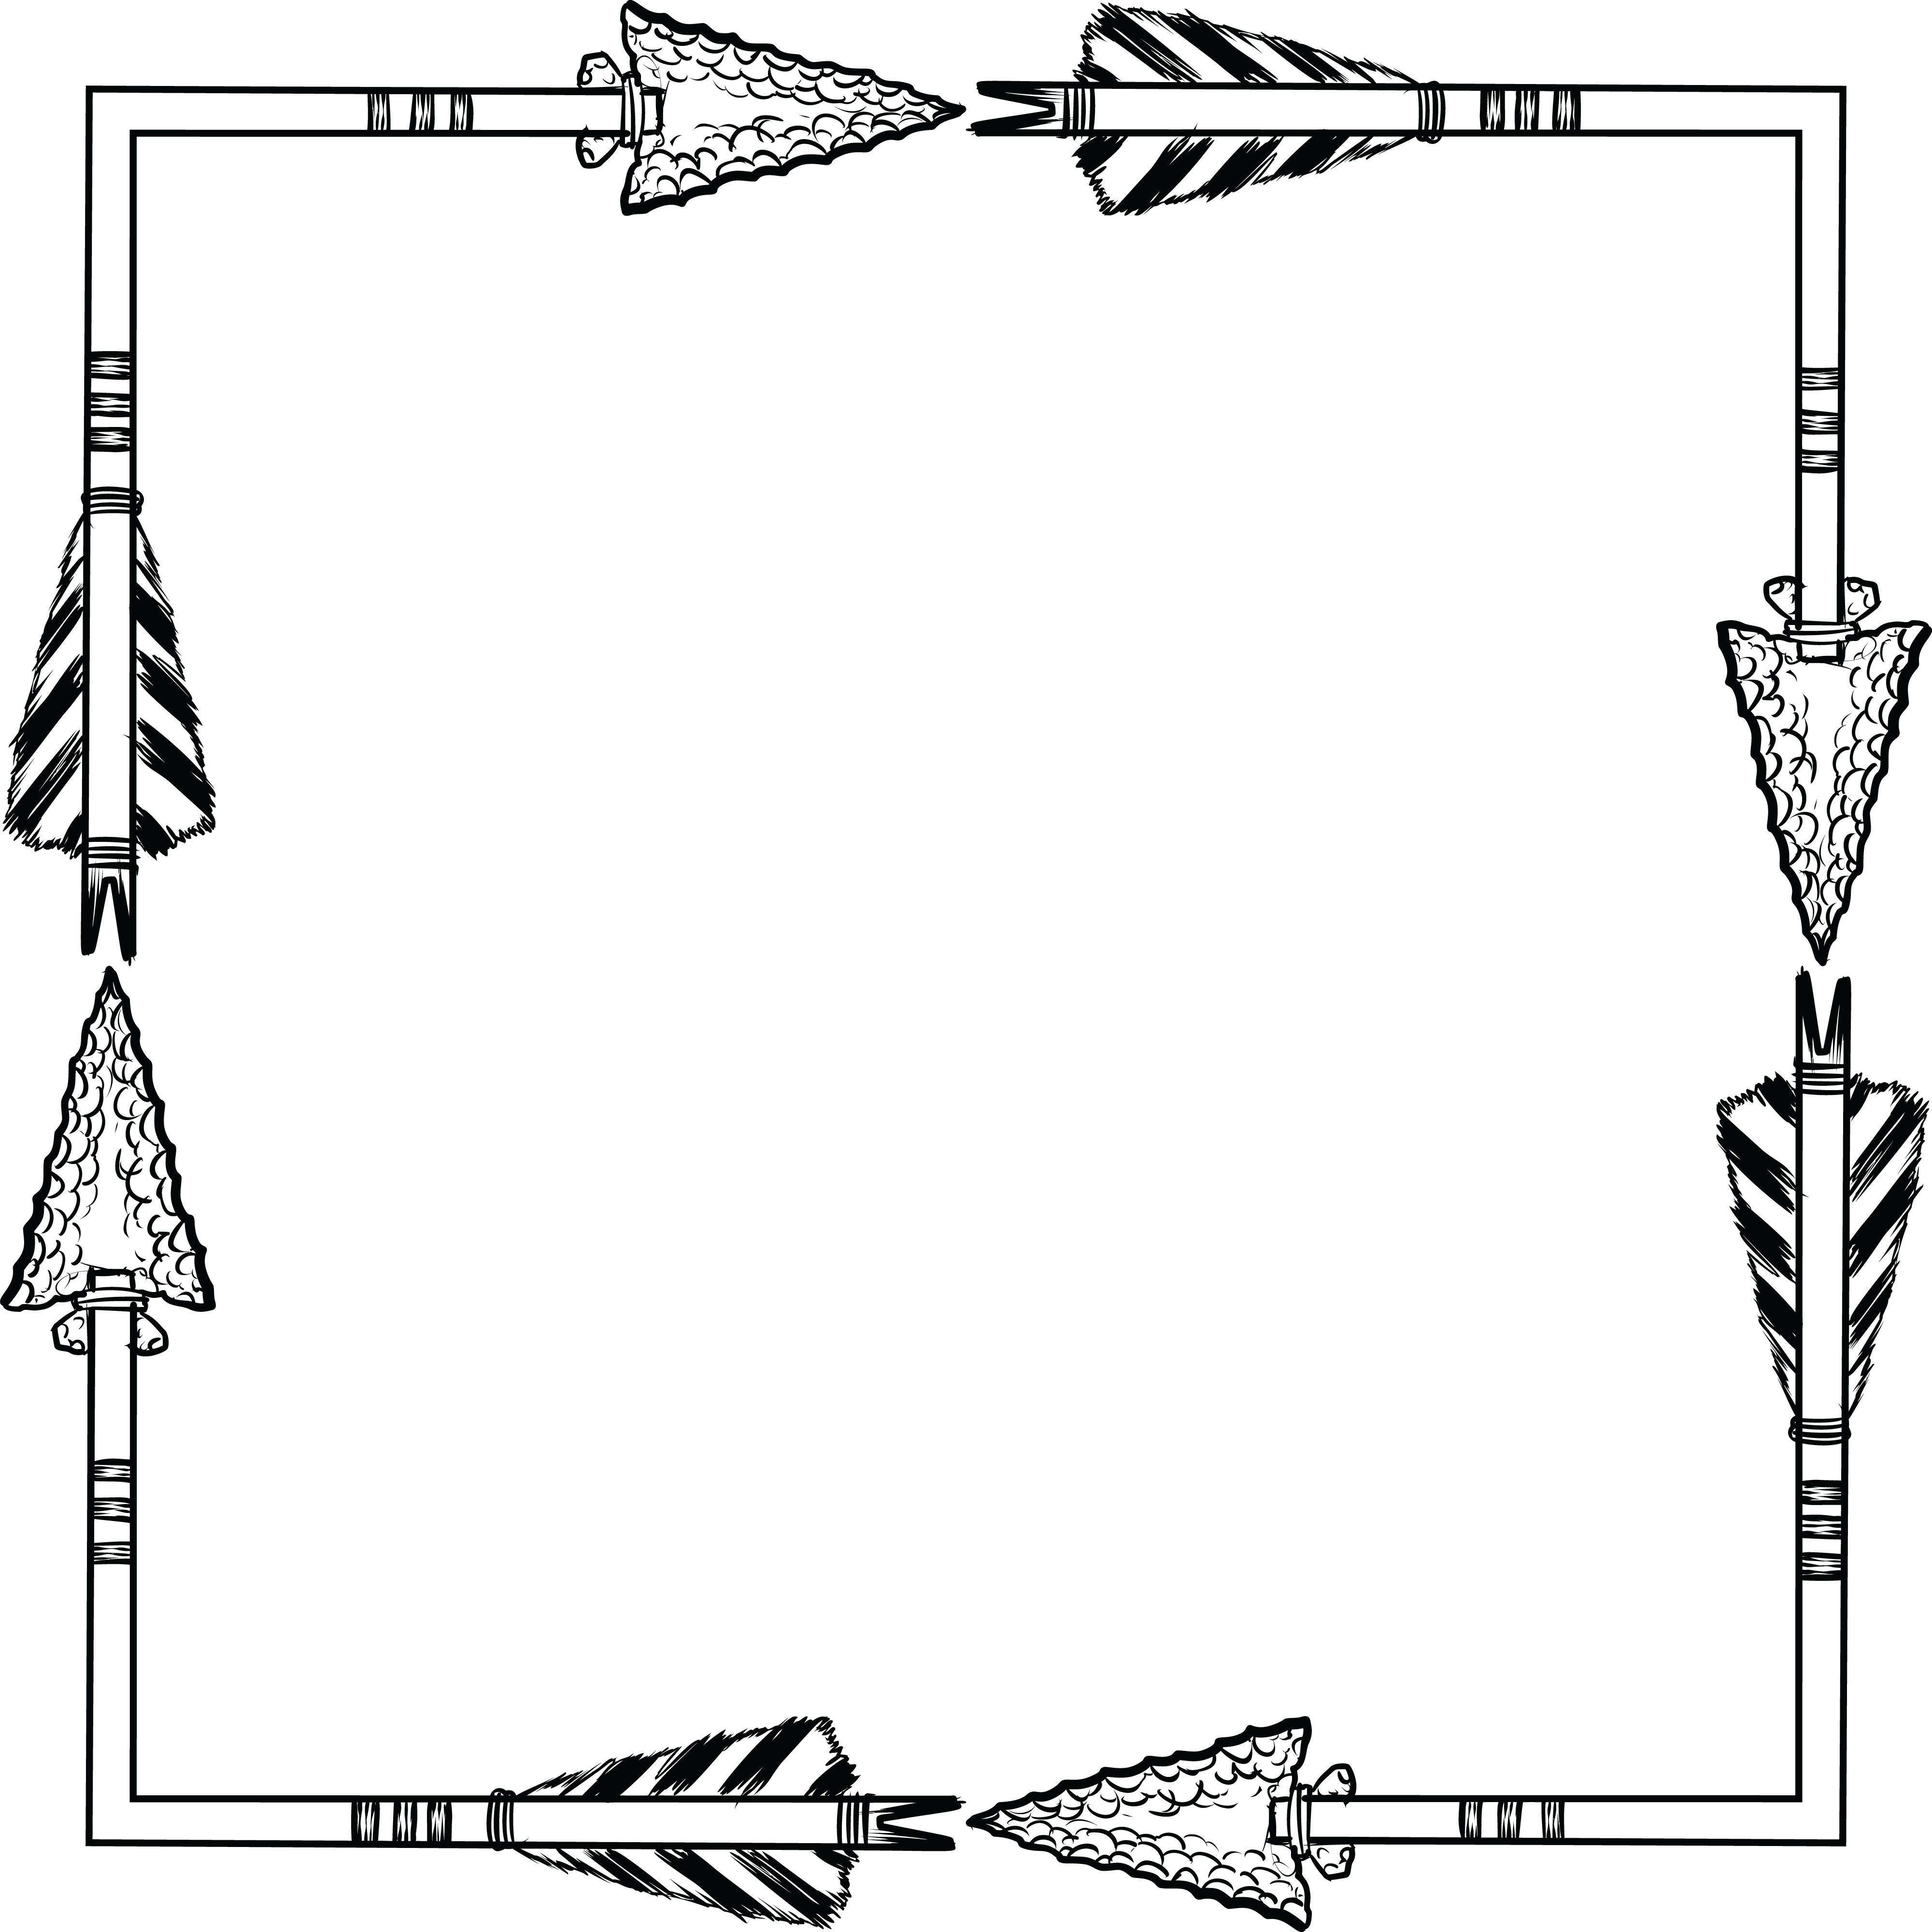 Free Clipart of a flint arrow square shaped frame.